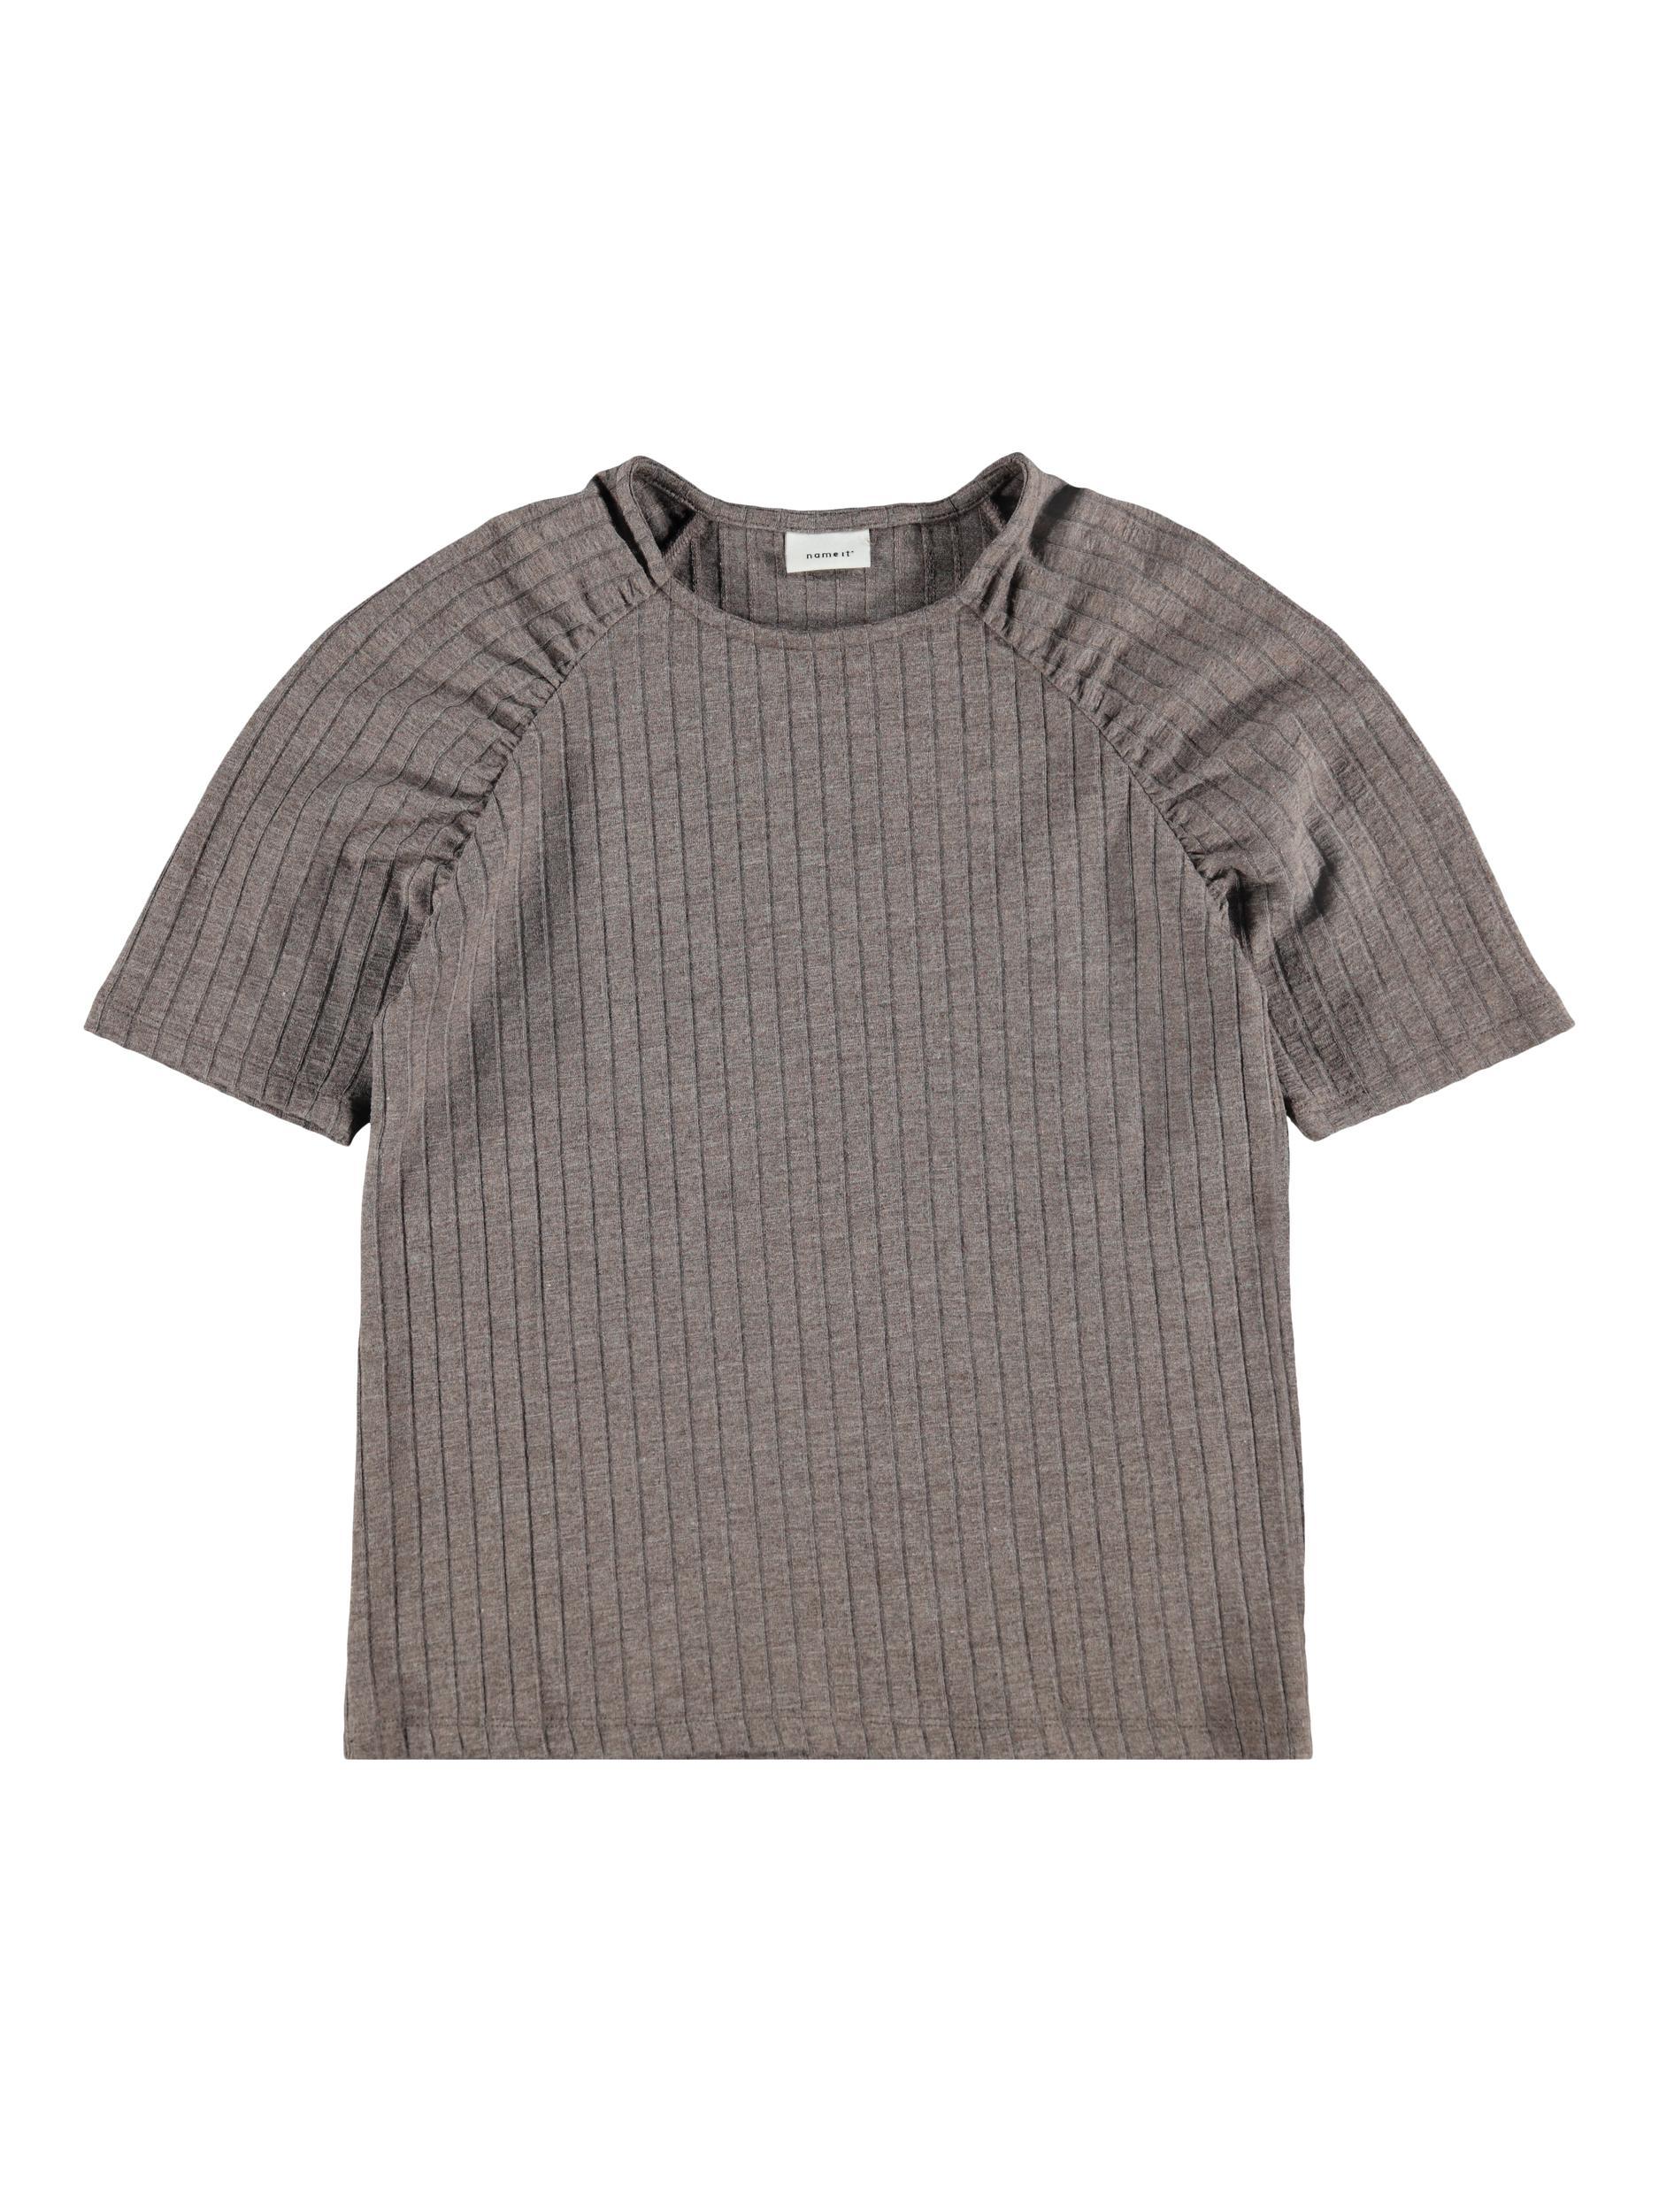 Name It Nolaa SS t-shirt